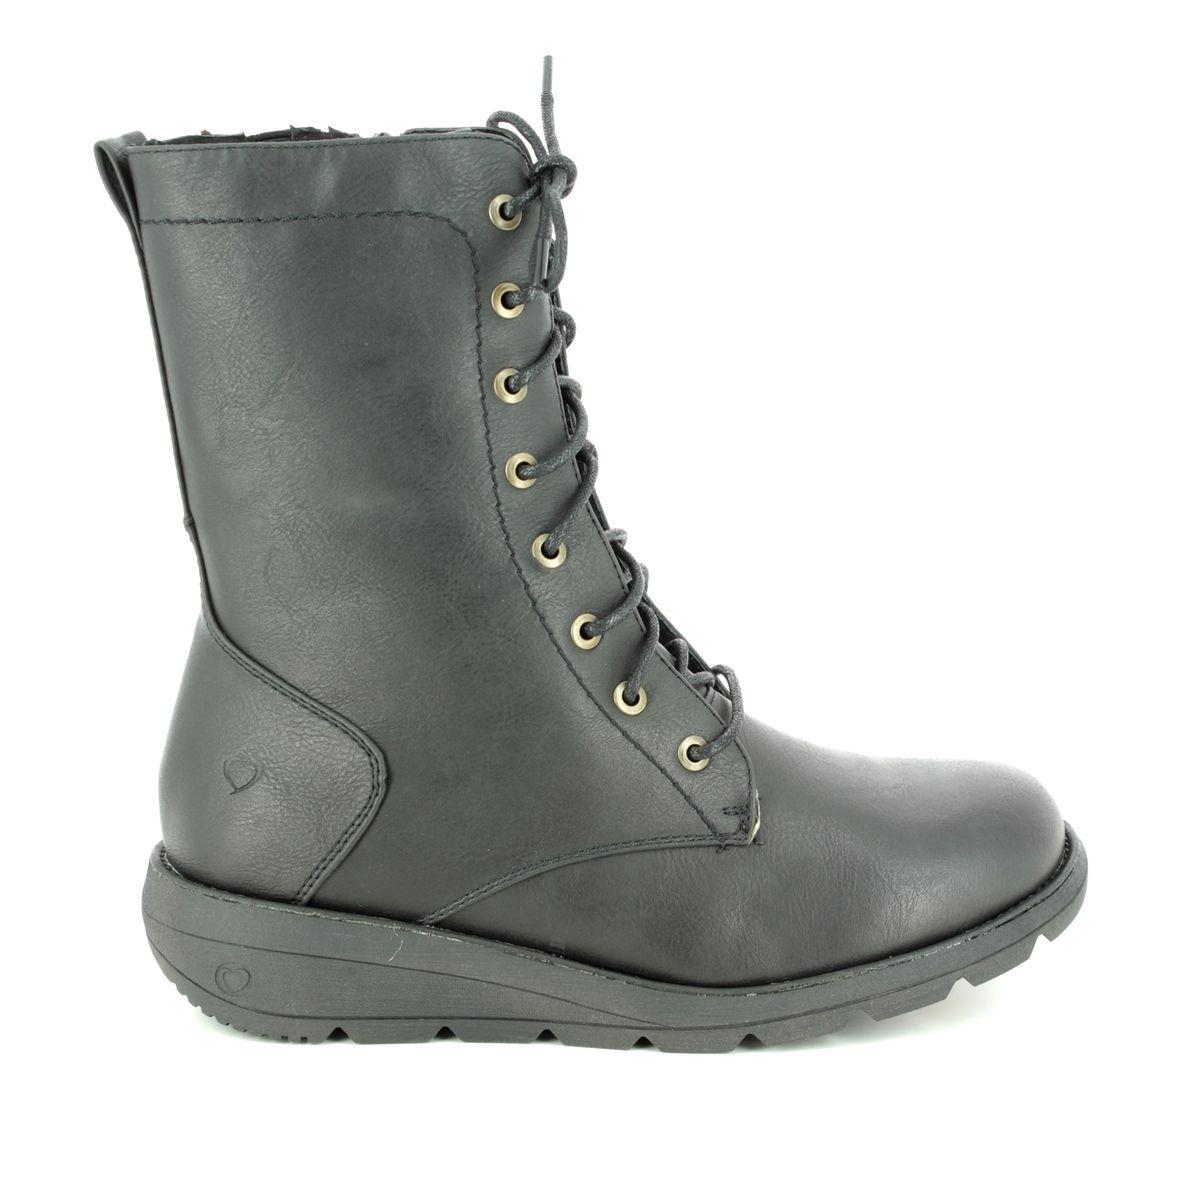 b9d8e46ff7e9 Heavenly Feet Ankle Boots - Black - 8516 30 WALKER 2